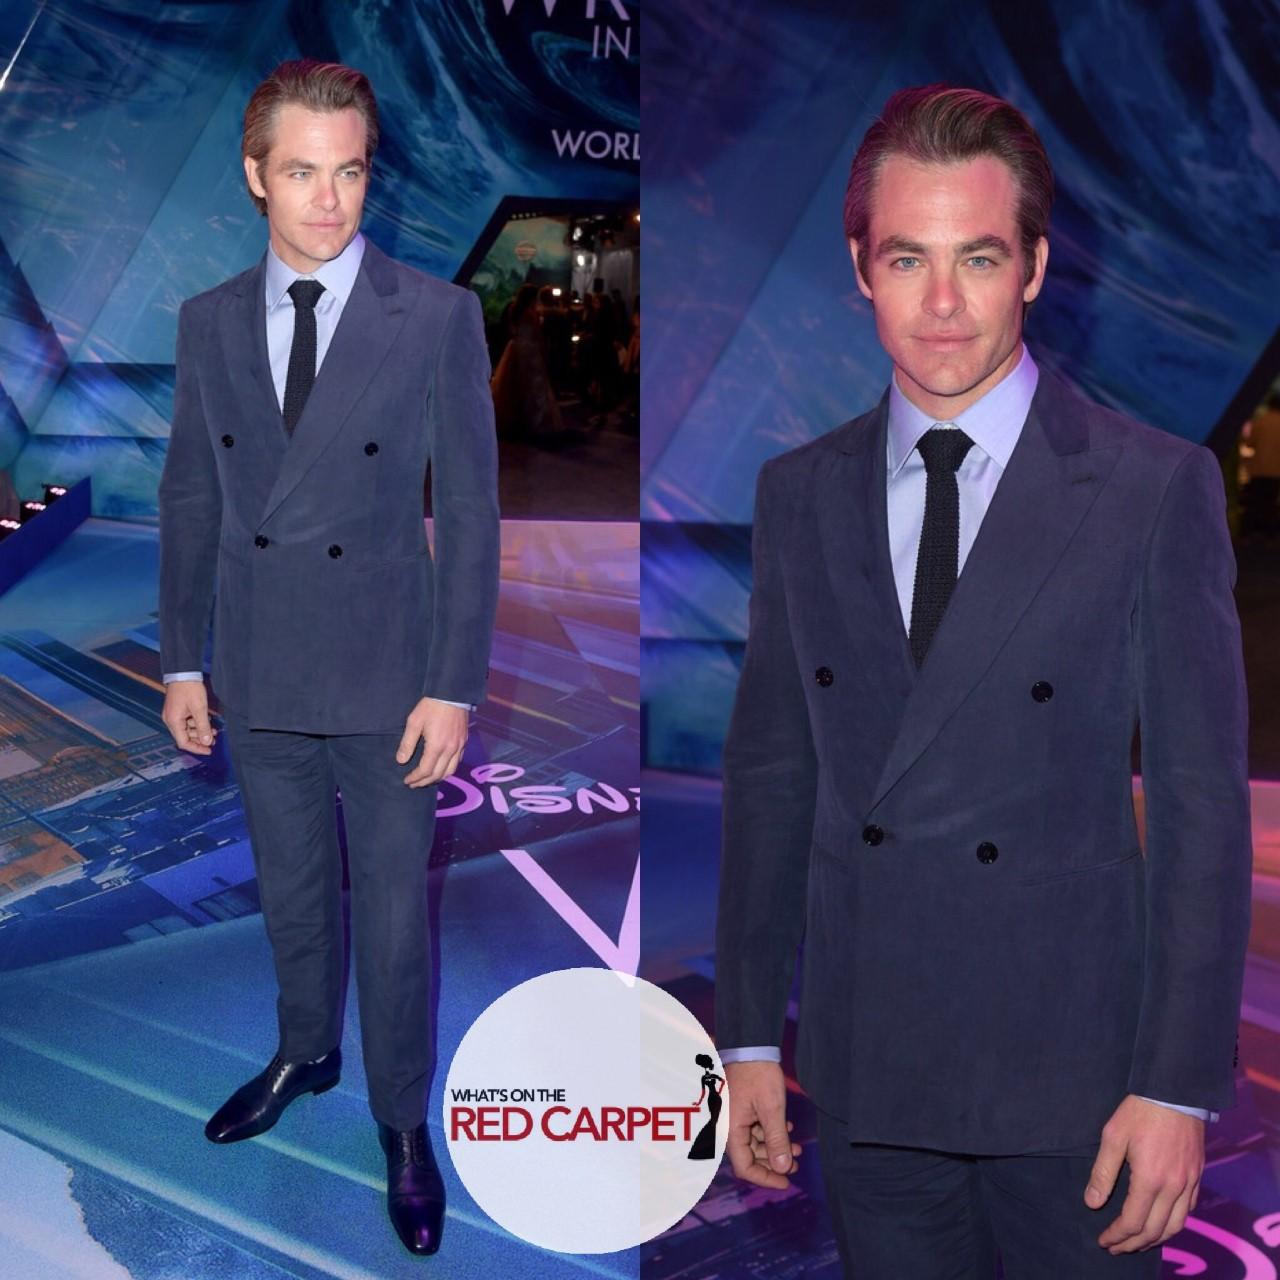 Chris Pine Giorgio Armani A Wrinkle in Time Los Angeles Premiere Fashion Style